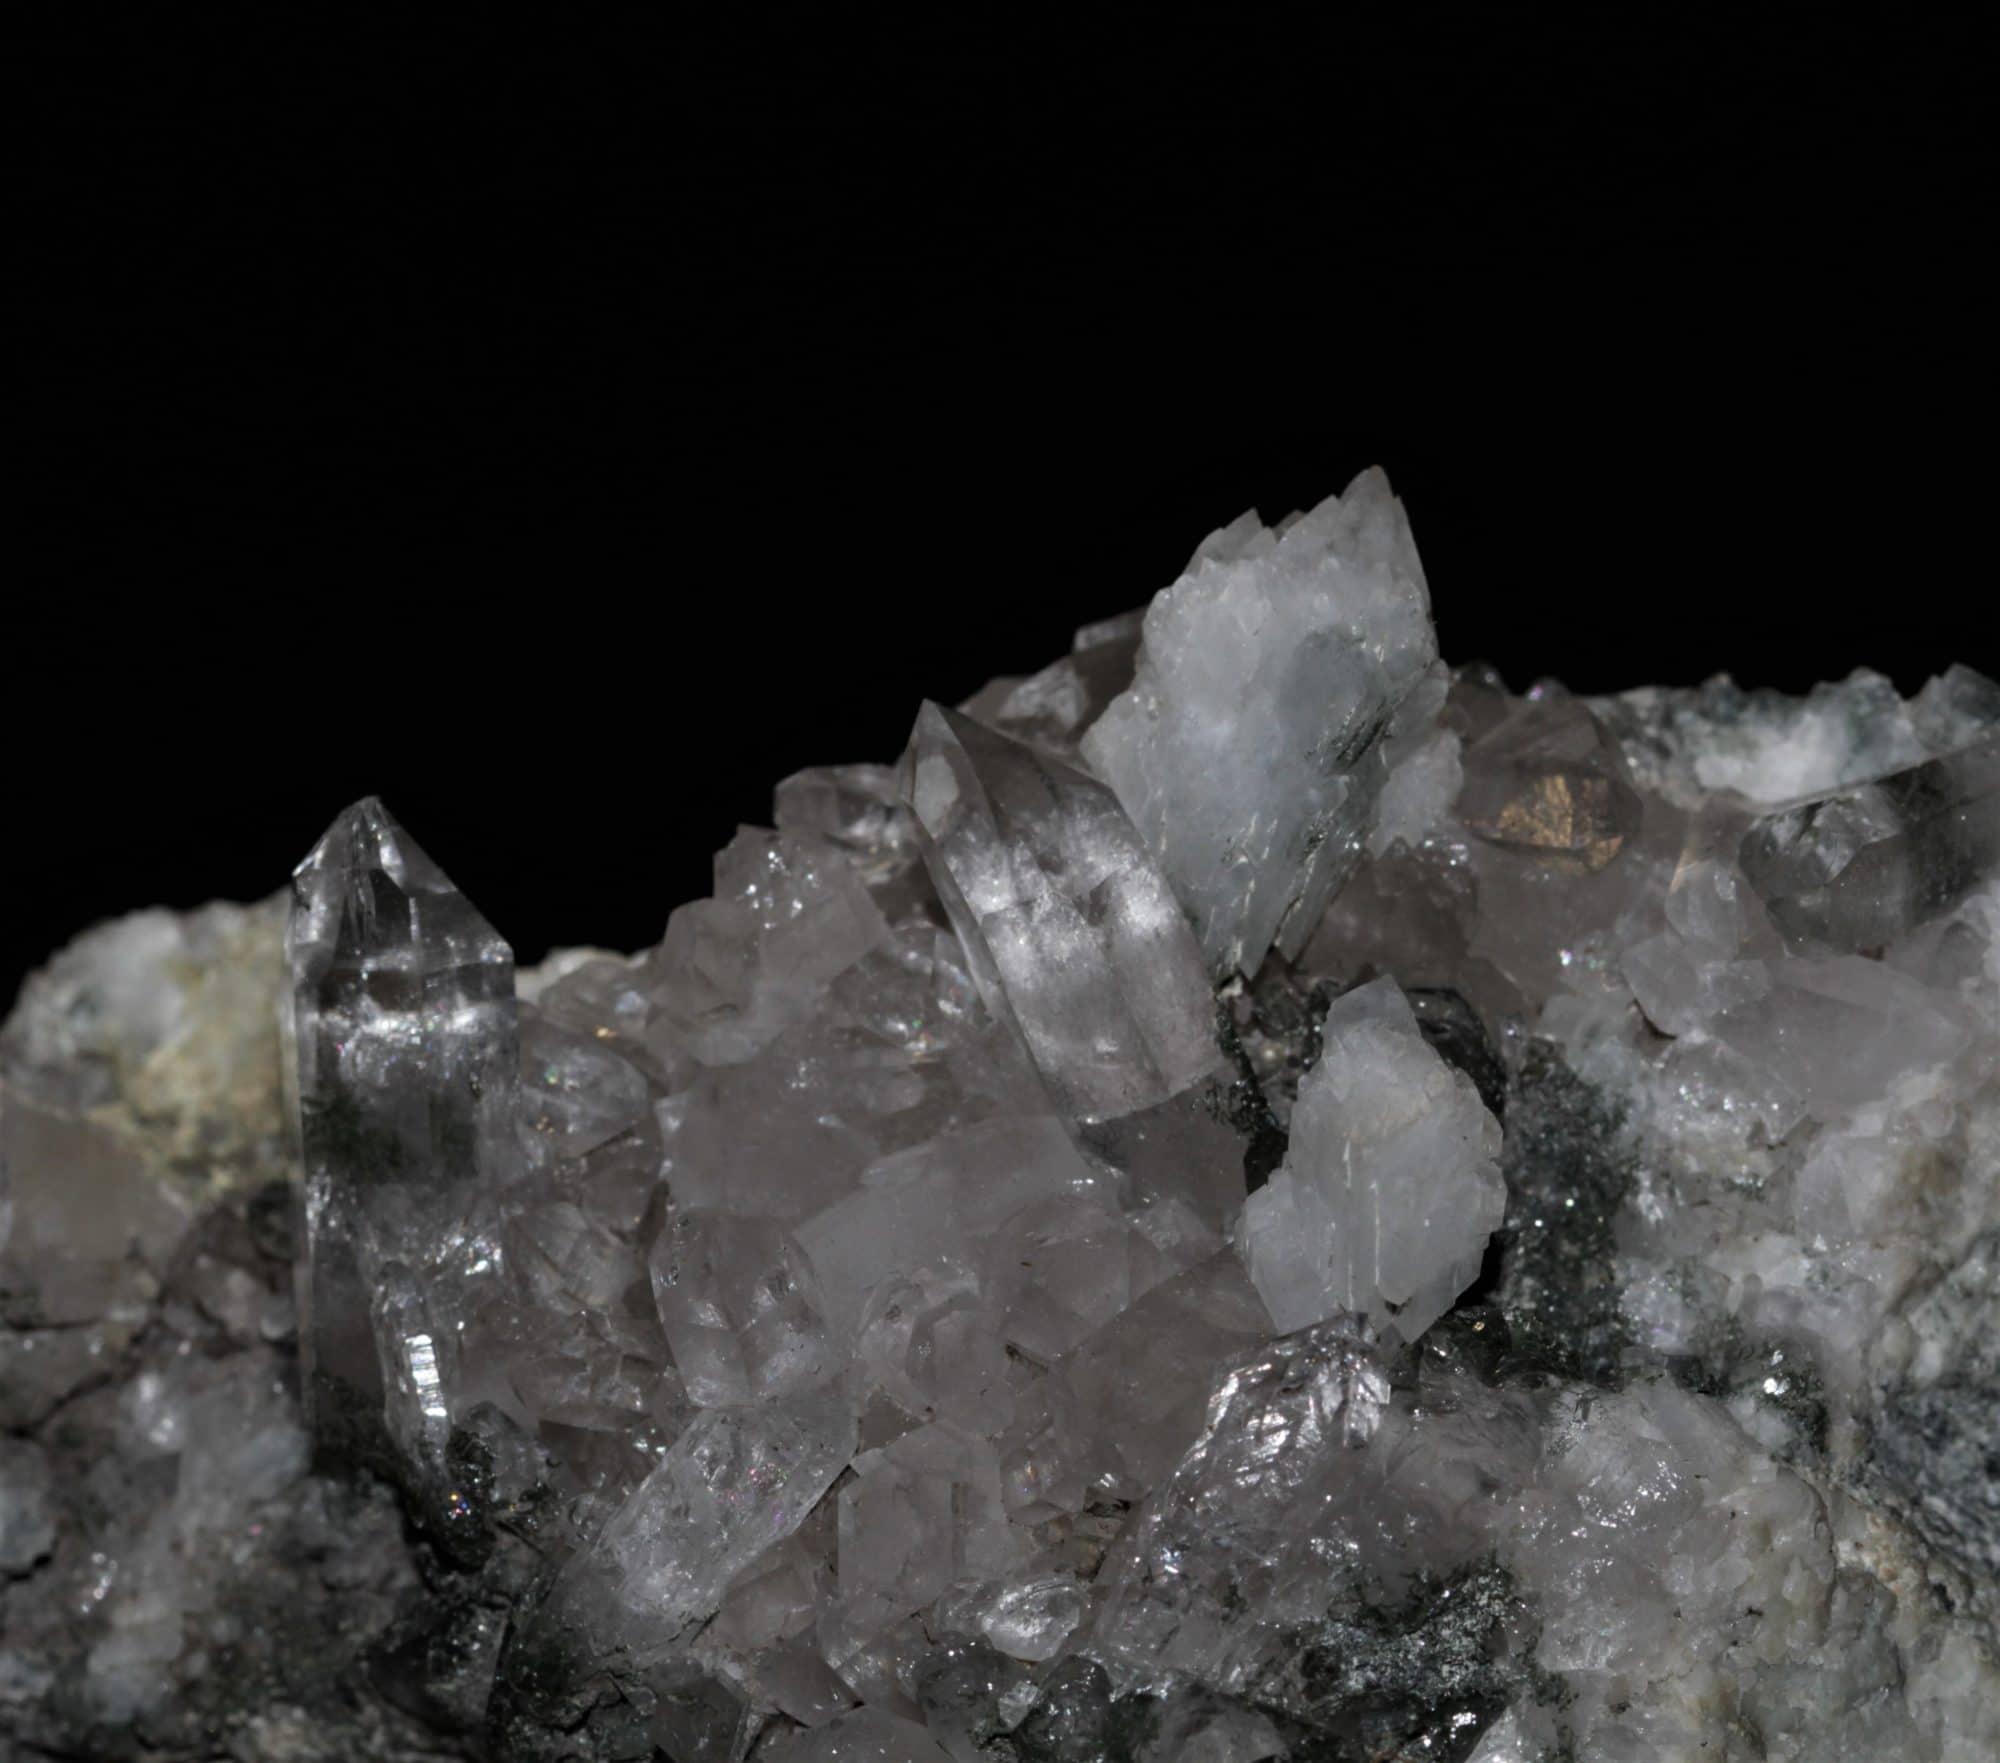 Adulaire et quartz, Les Contamines Montjoie, Haute-Savoie.